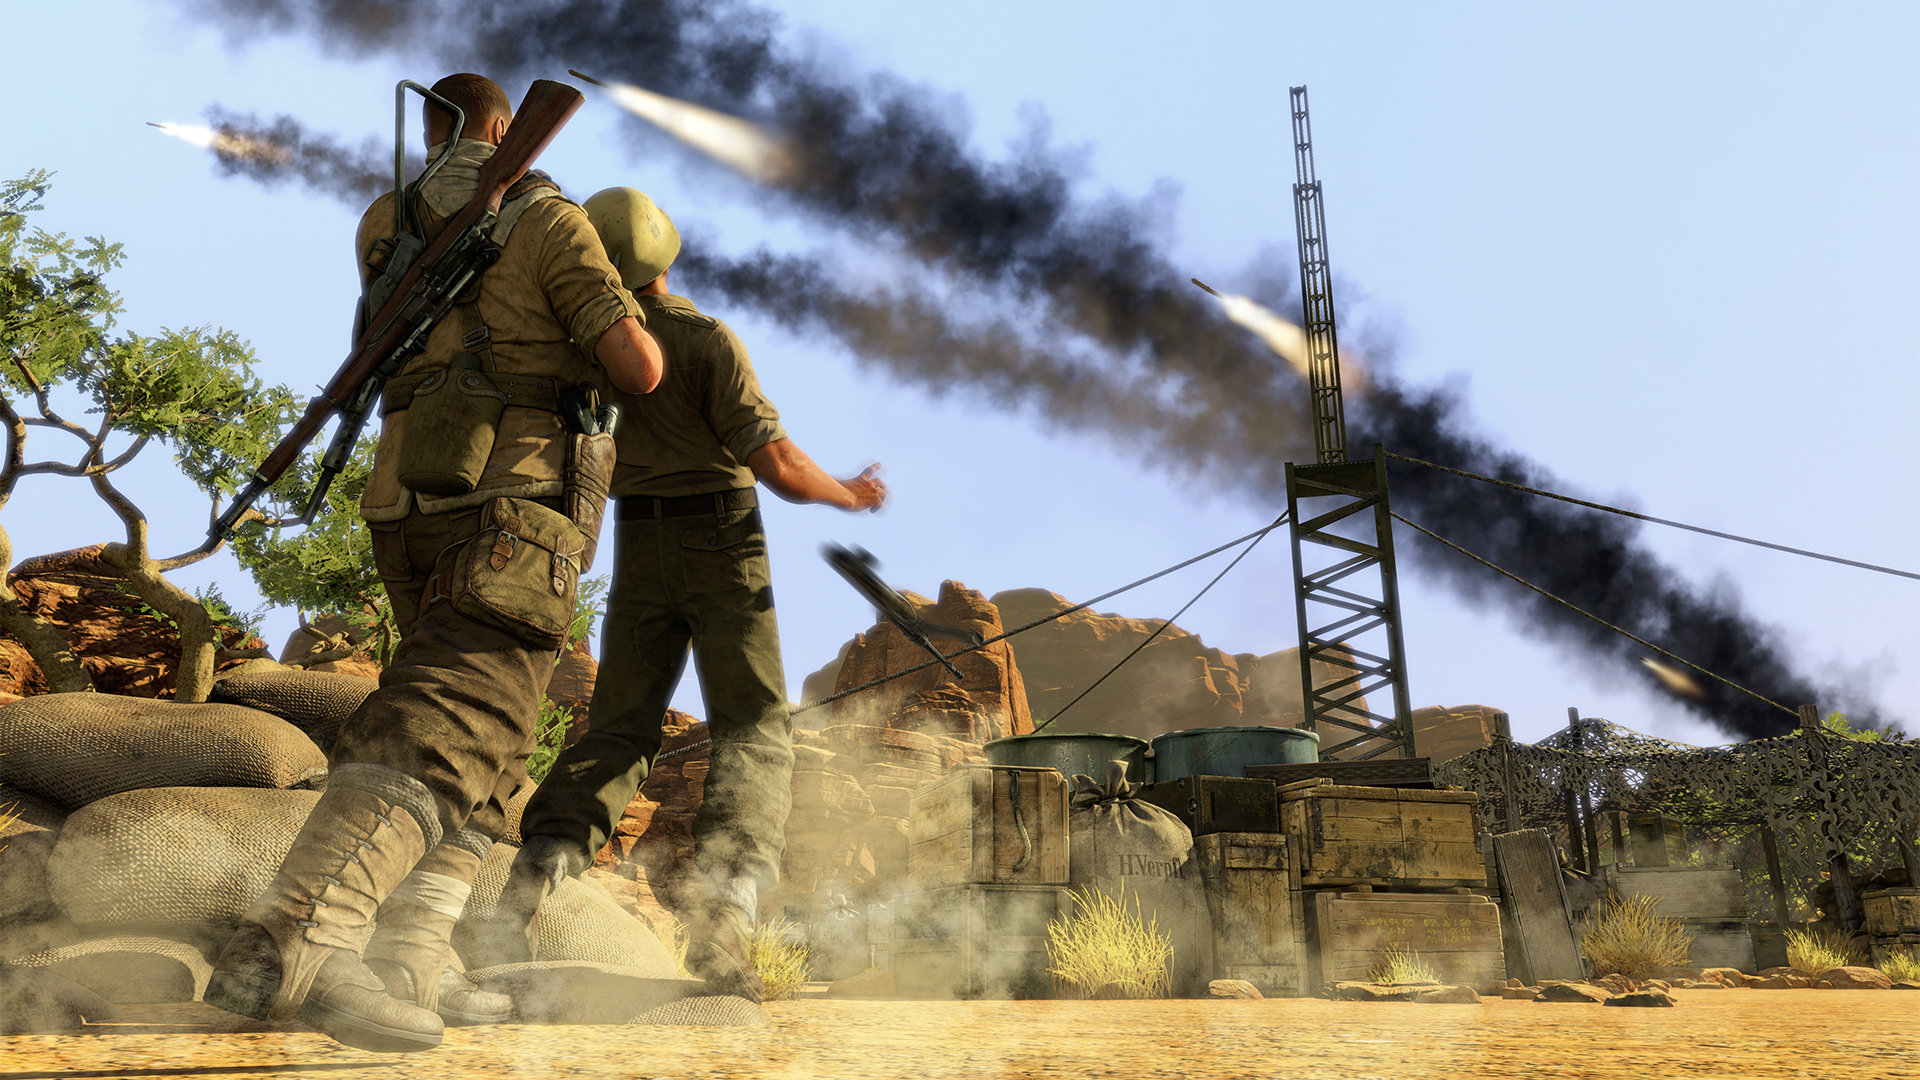 sniper-elite-3-screenshot-06-ps4-us-12ju